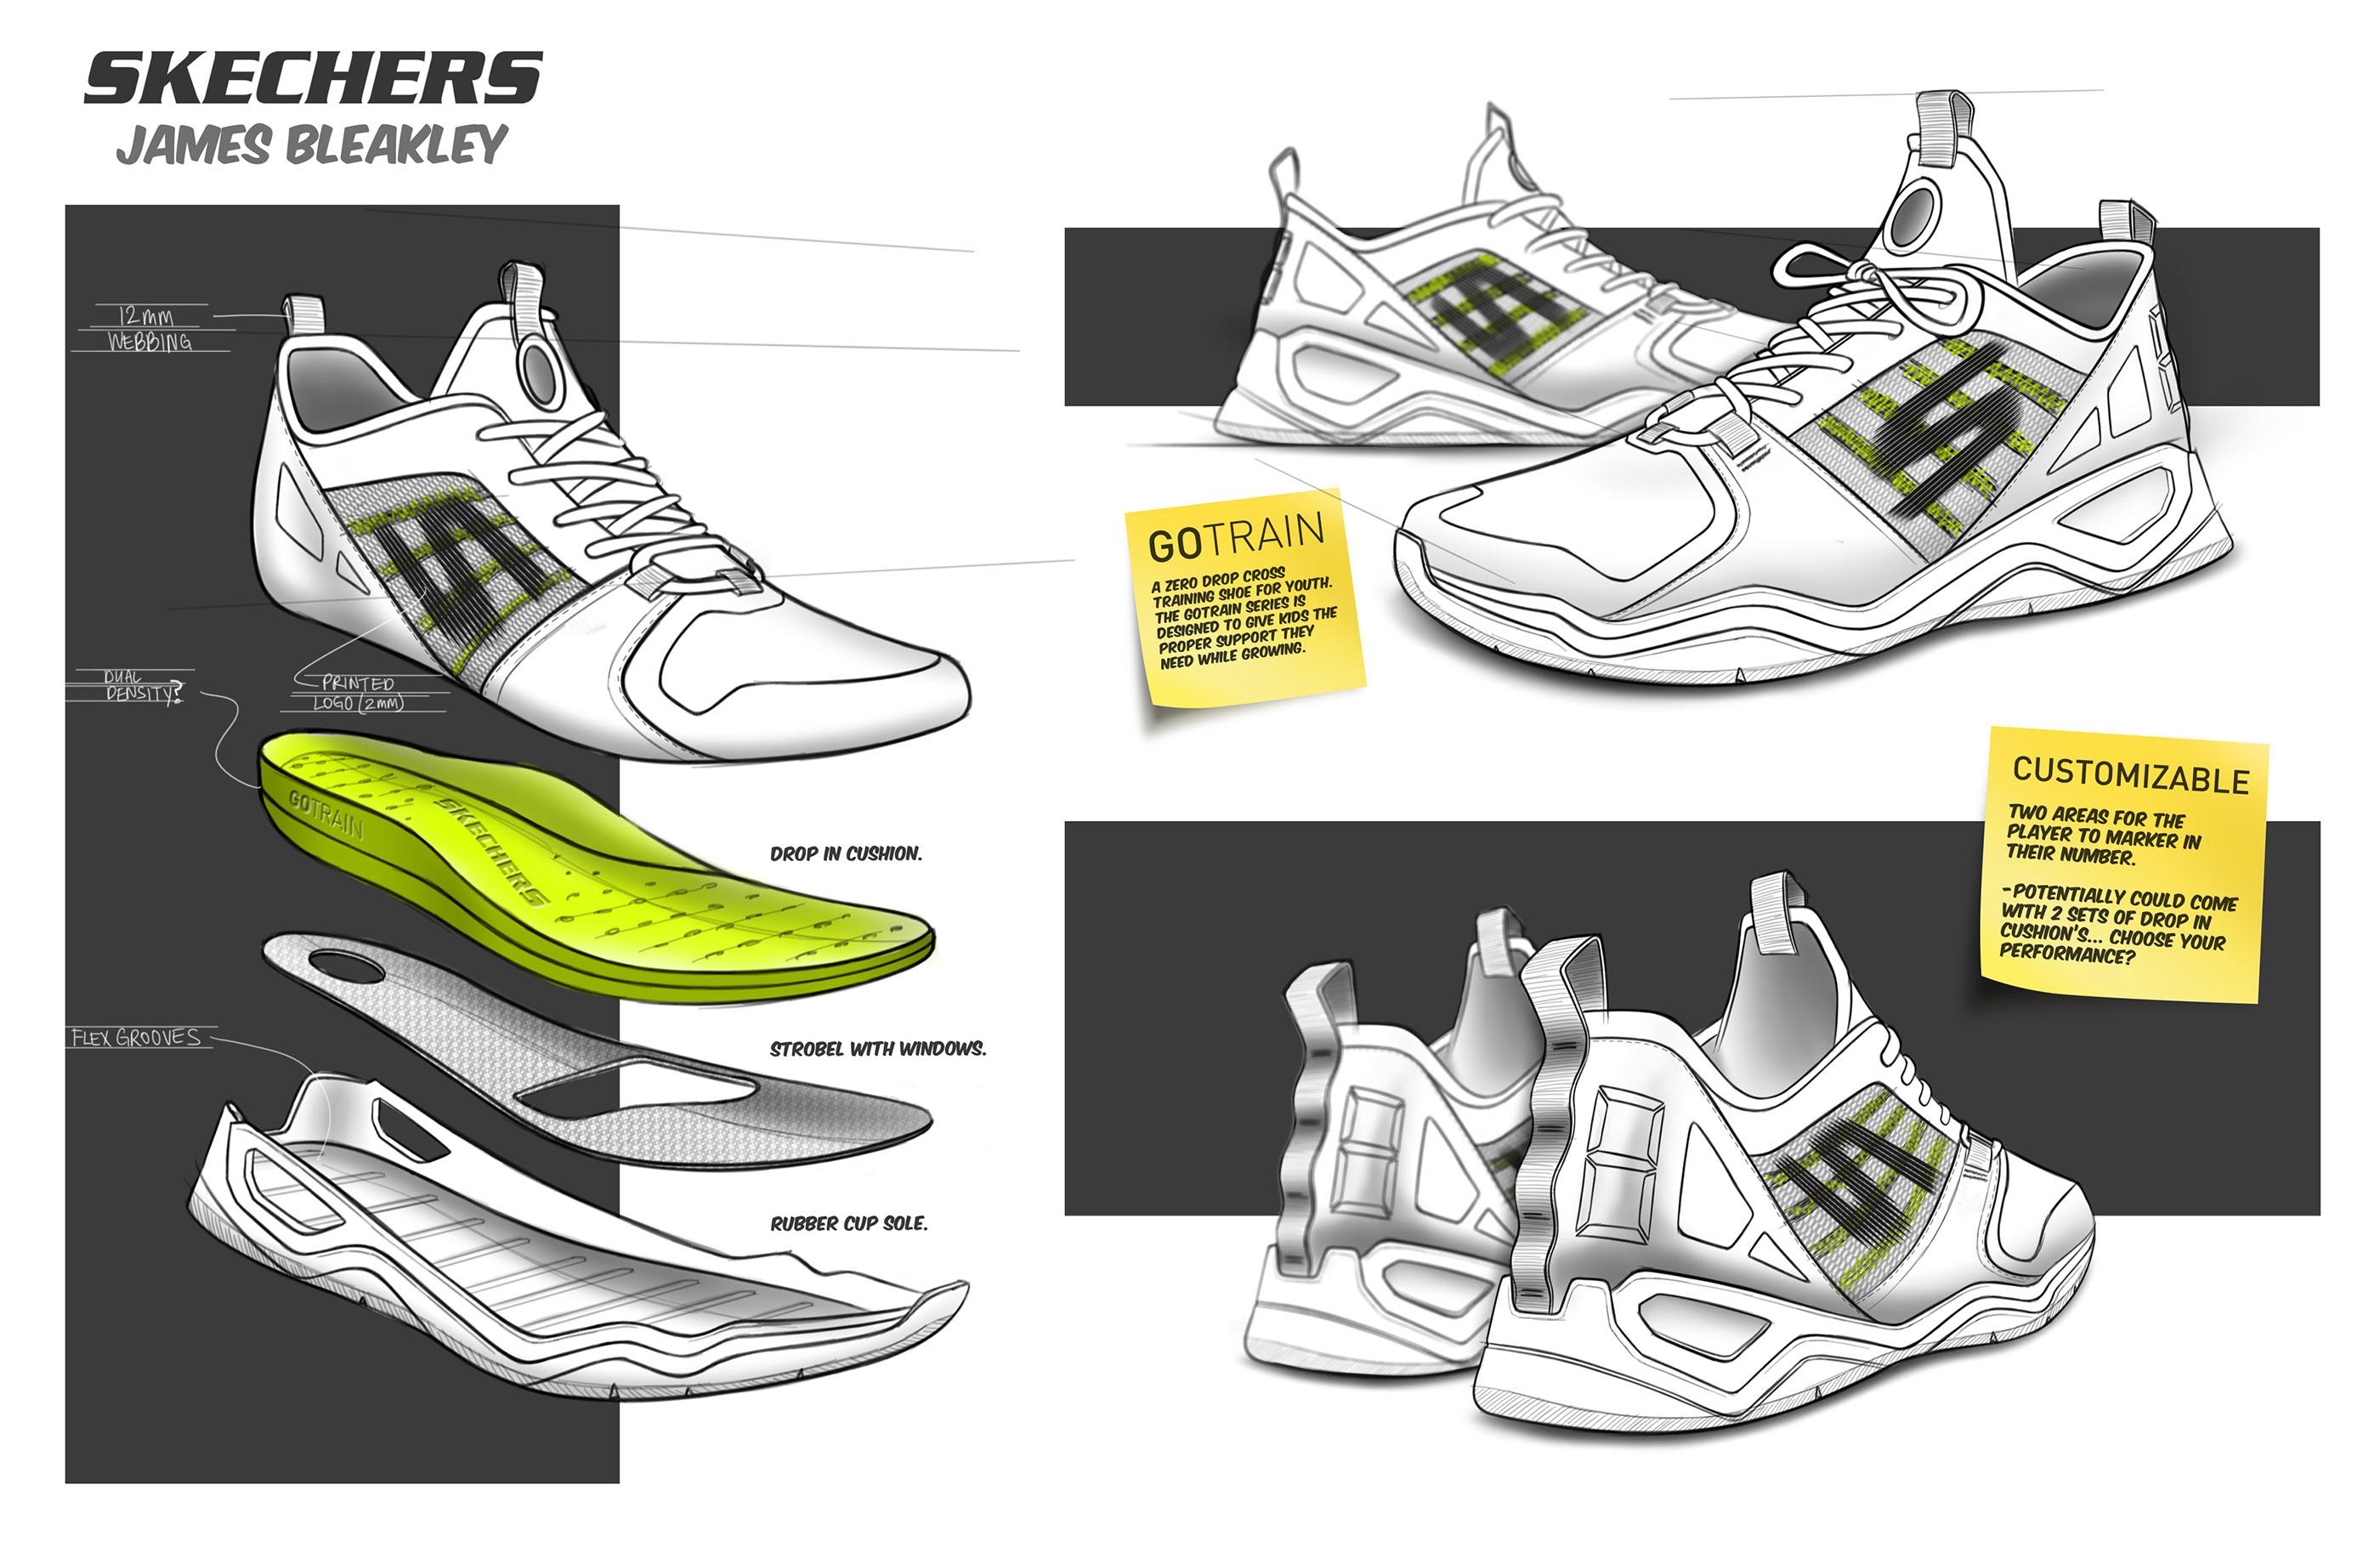 Skechers GOTRAIN: Youth Training Shoe